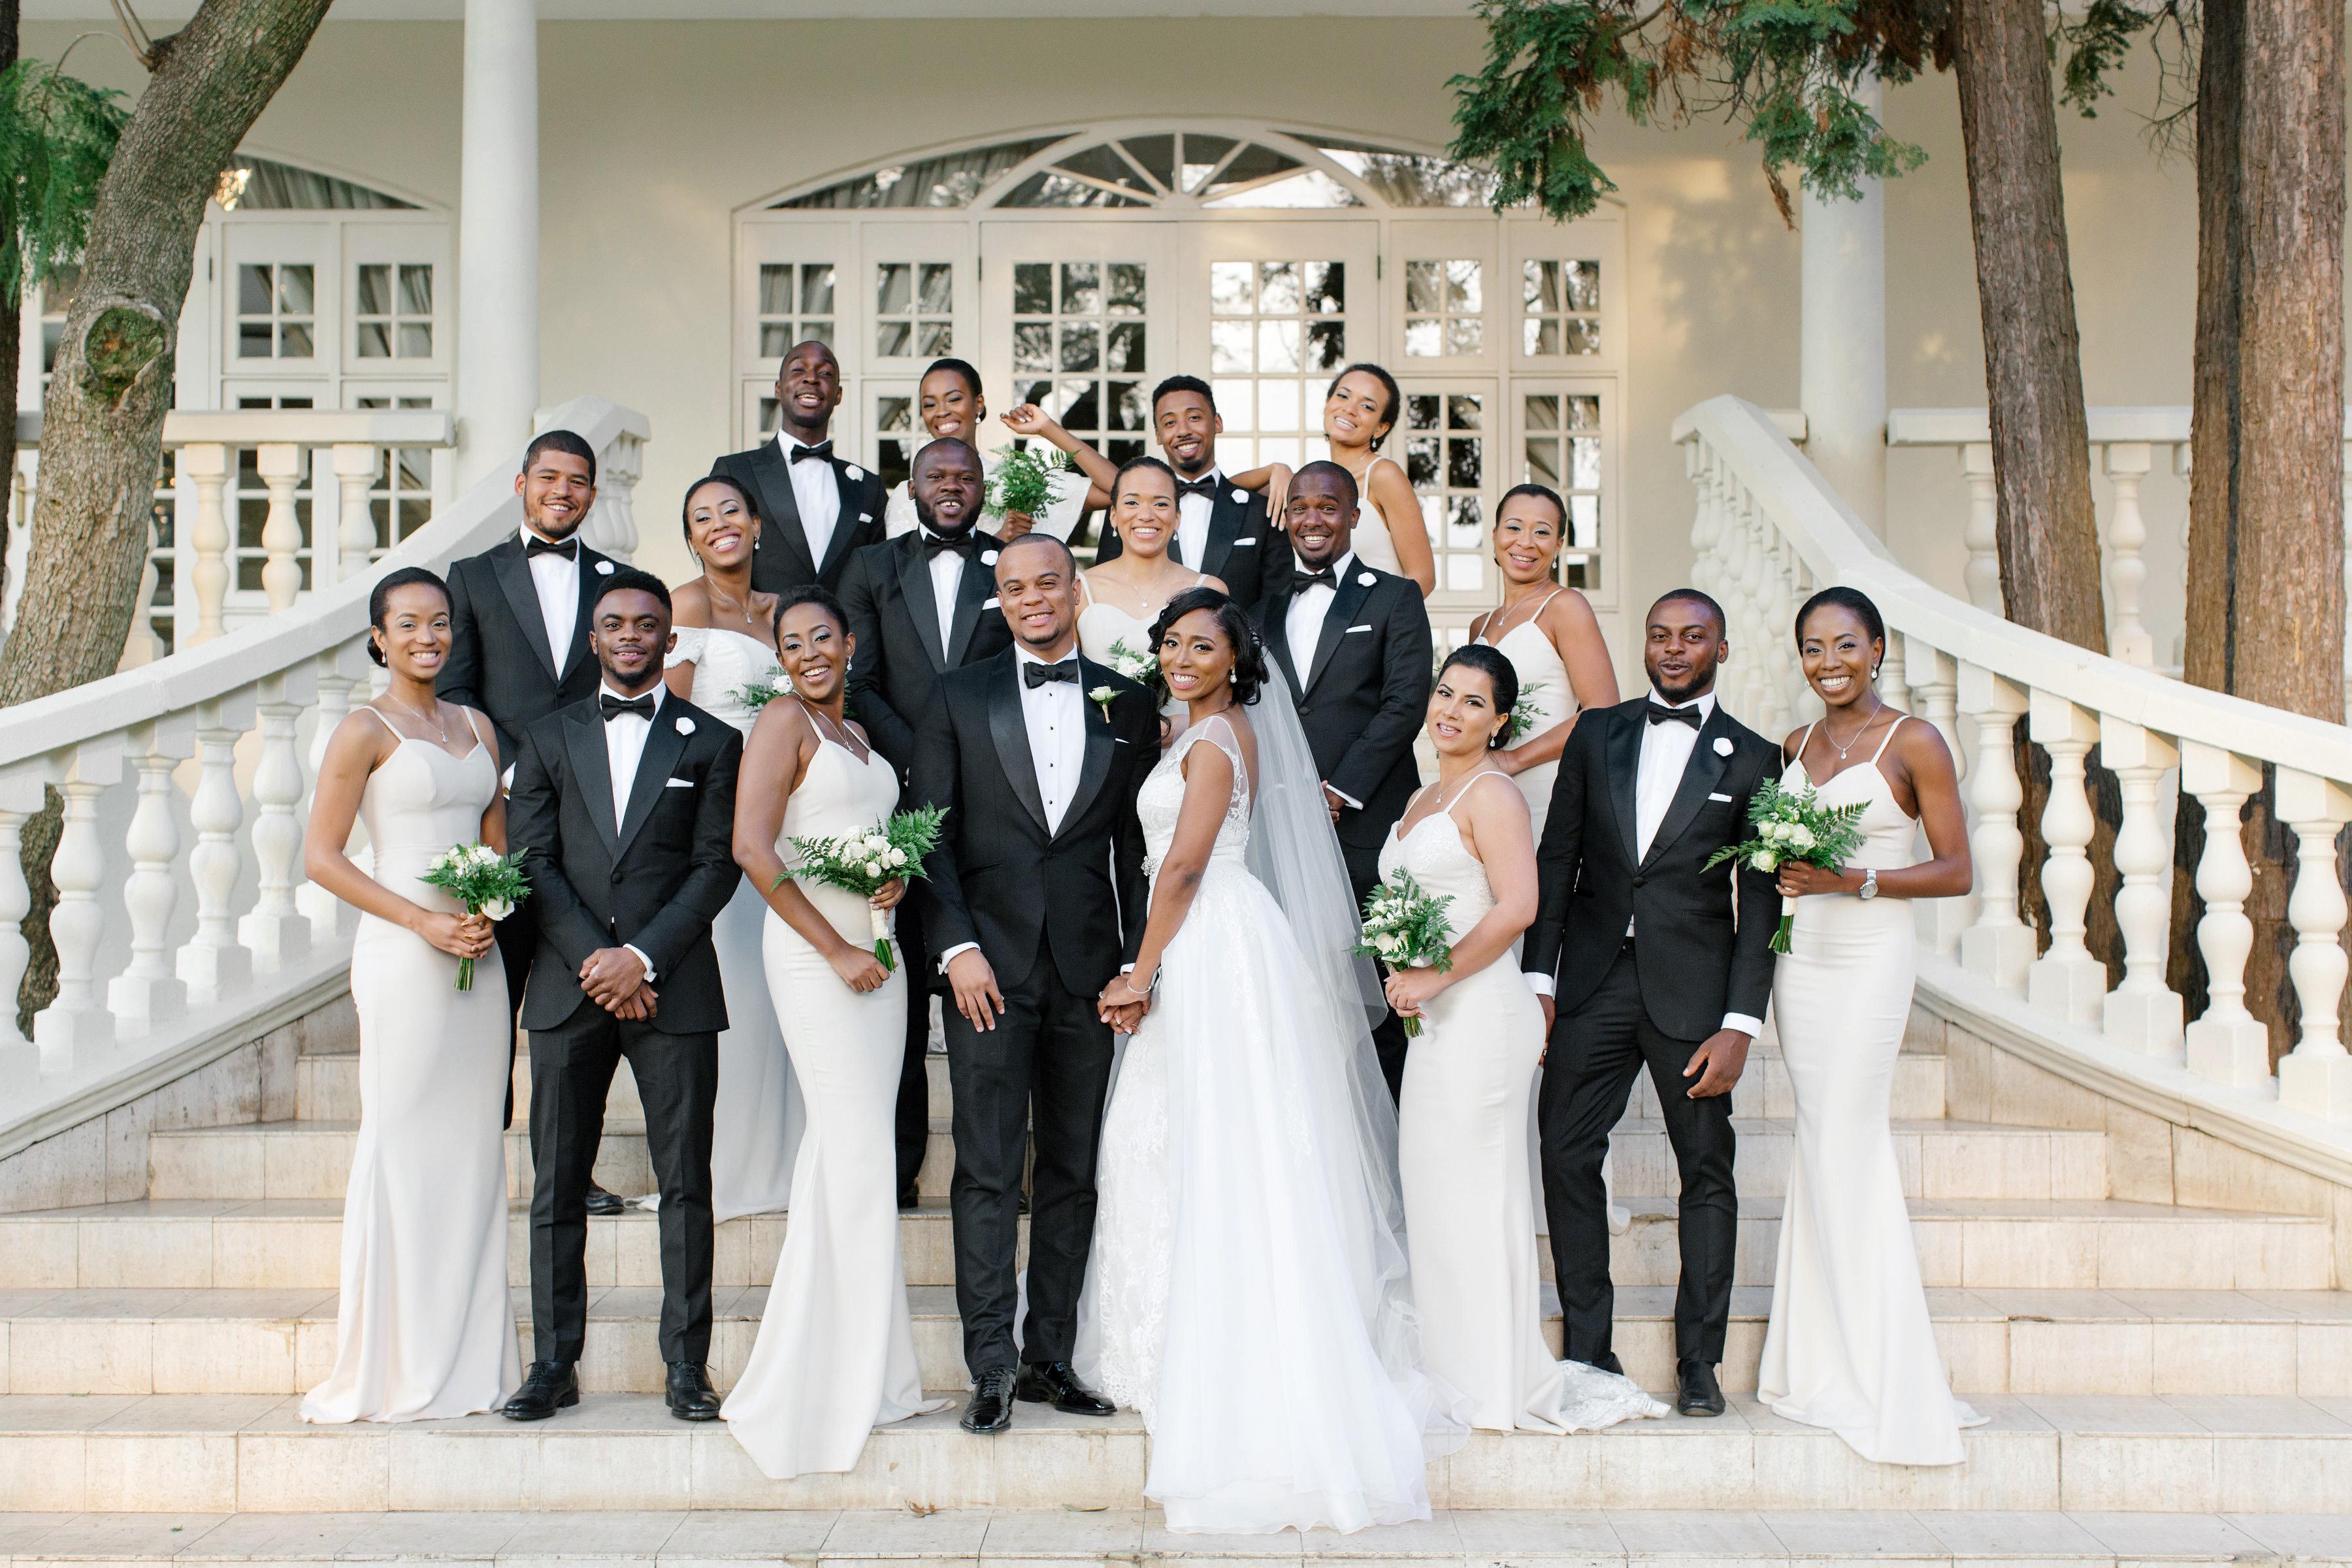 chloe shayo south africa wedding bridal party steps